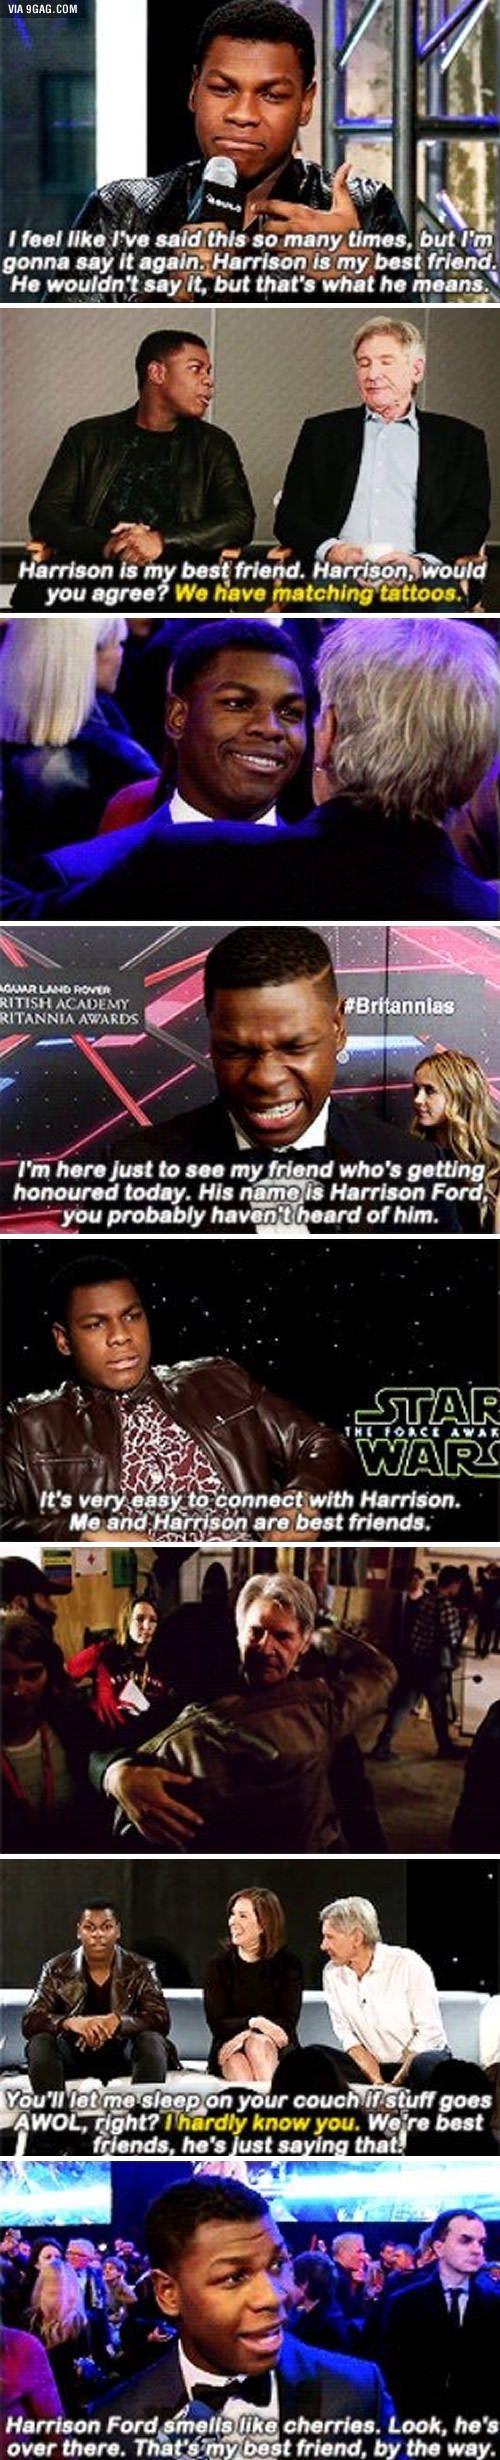 John Boyega seems to like Harrison Ford. In fact, it's possible they're best friends.